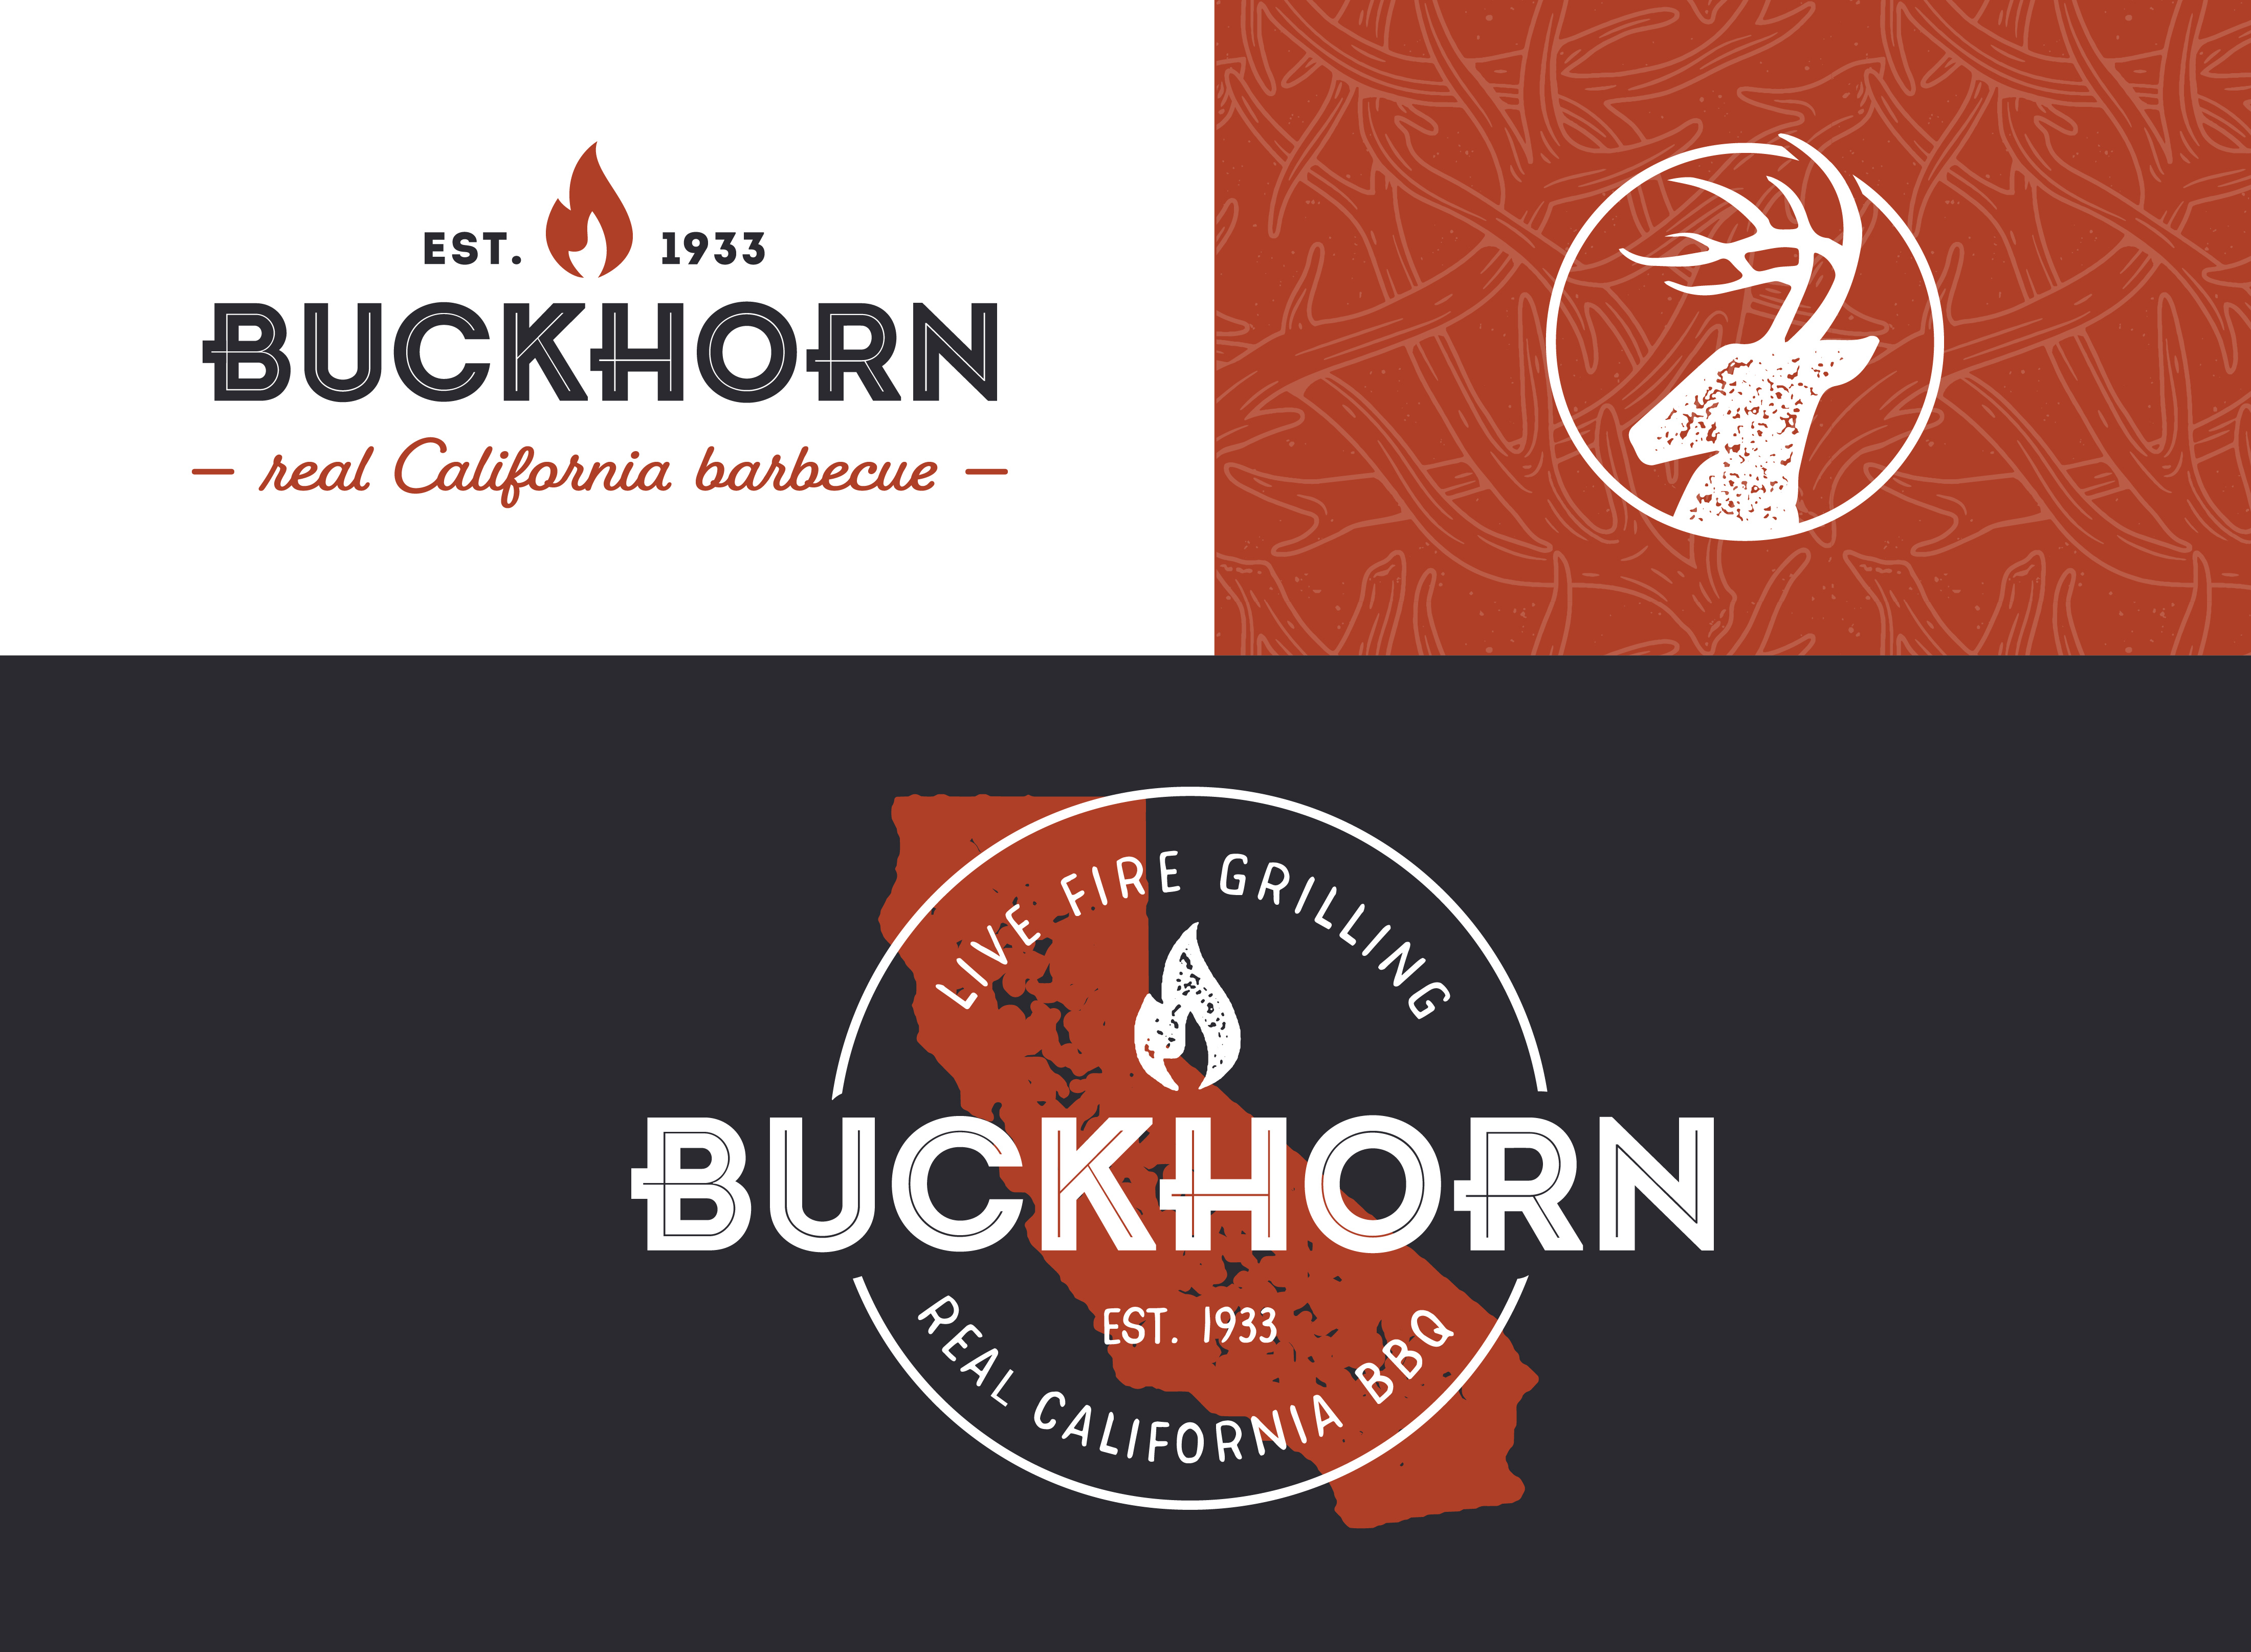 Buckhorn Grill Scribe Creative Agency